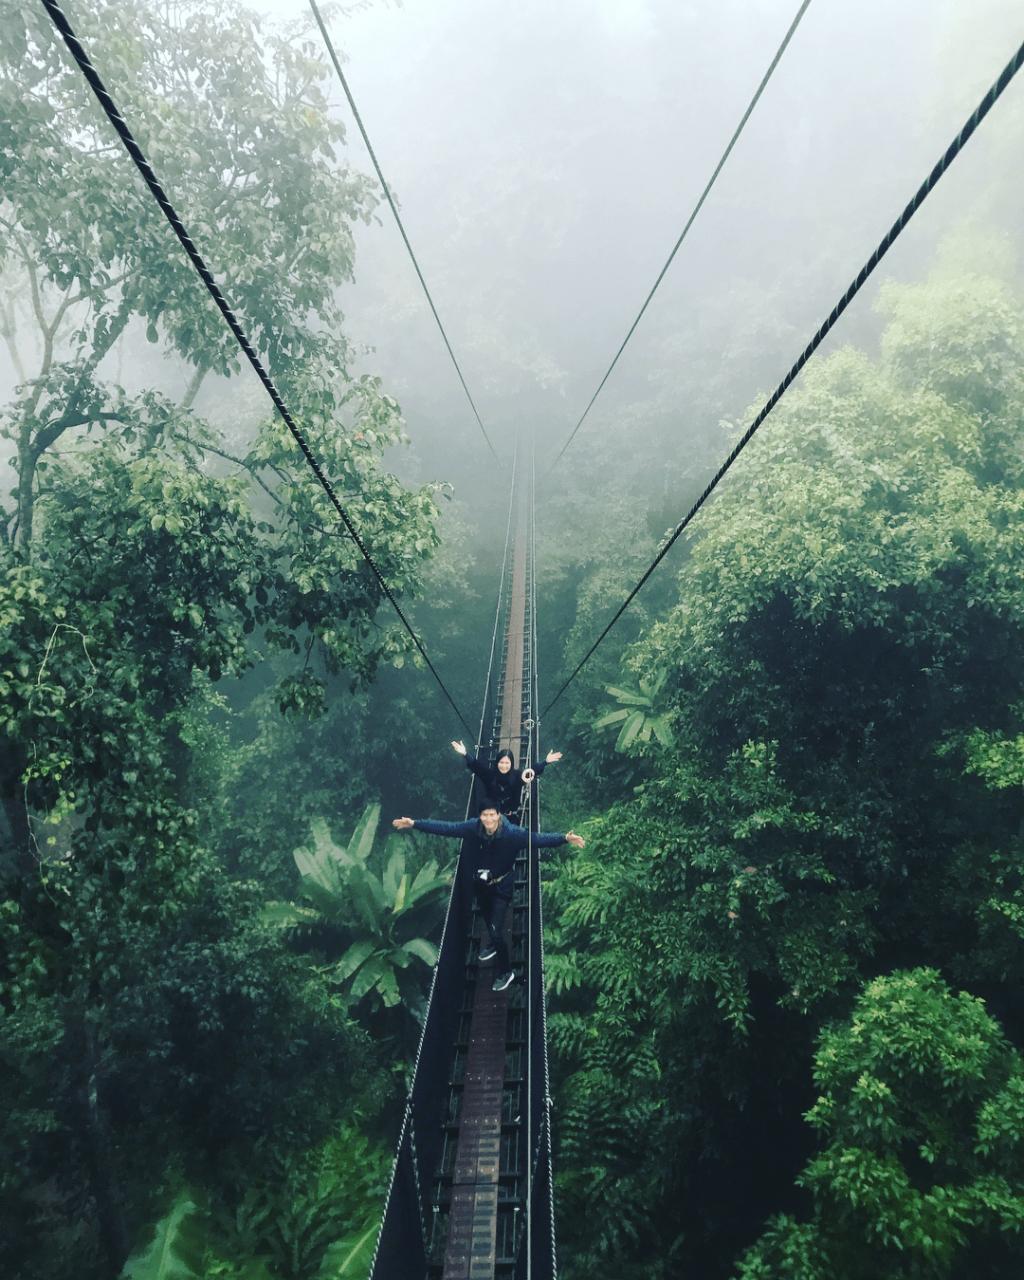 mae fah leung treetop canopy walk suspension bridge